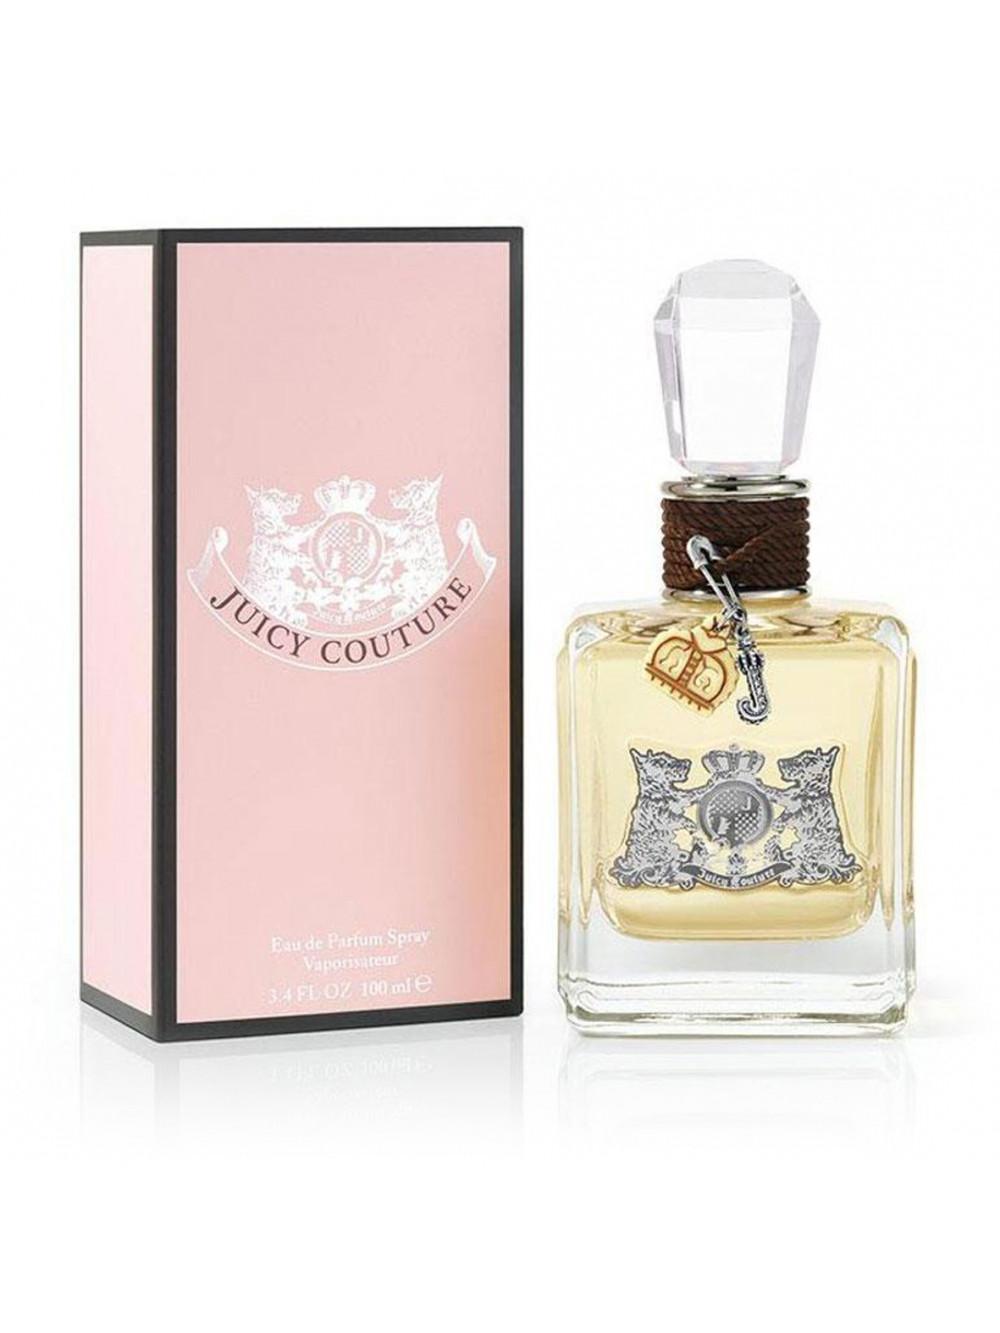 78ff7bda254 Juicy Couture parfum femme sensuel pas cher très longue tenue chaud style  giorgio. Loading zoom